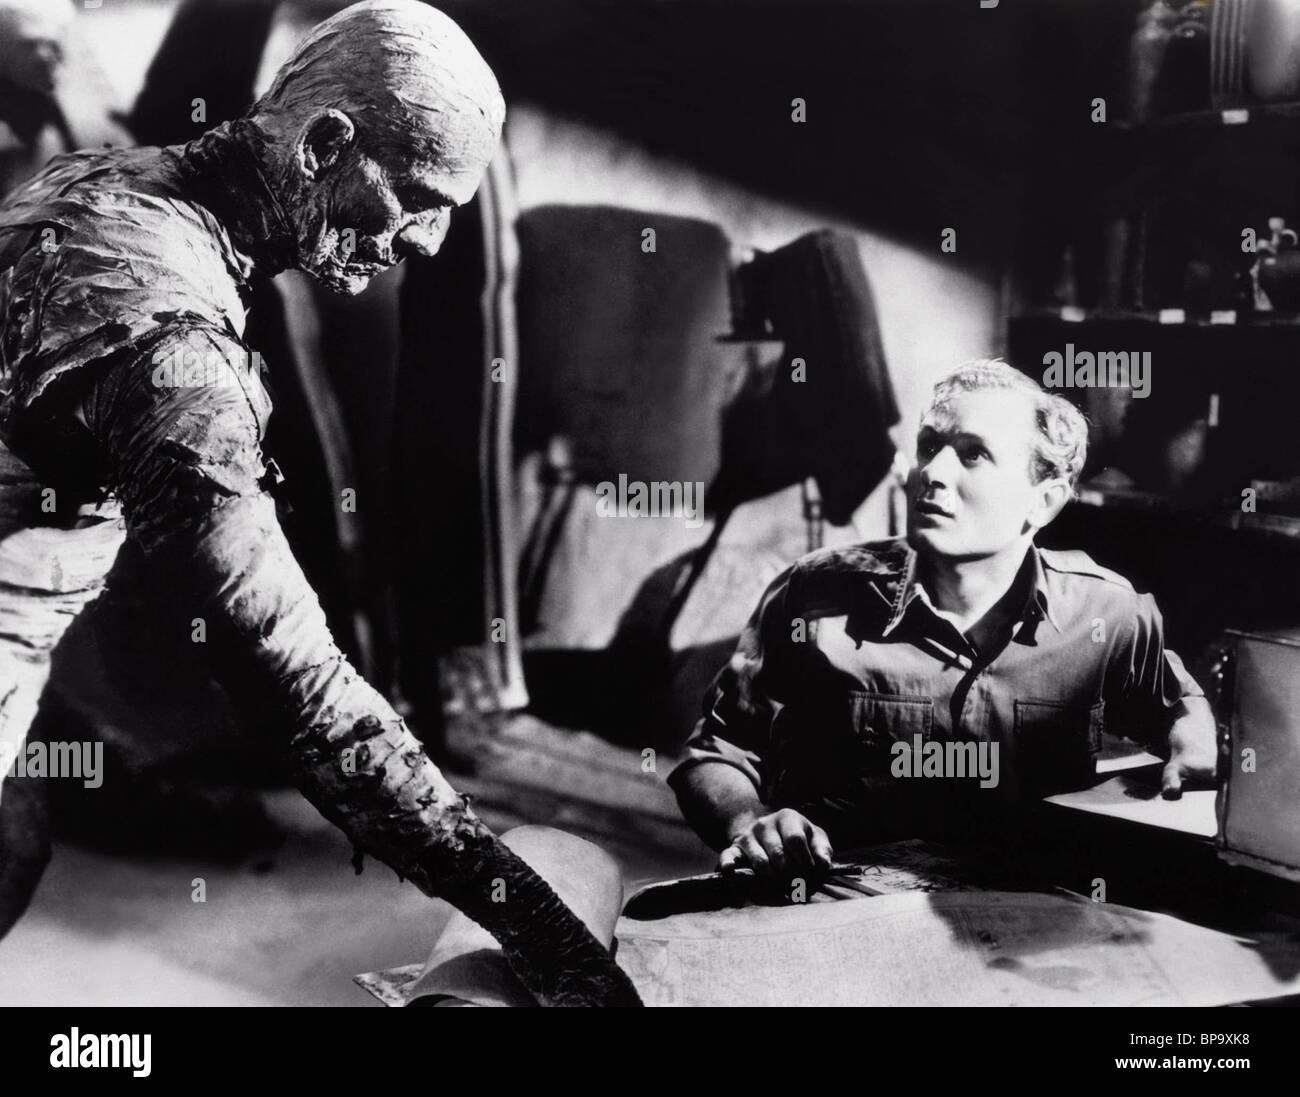 boris-karloff-david-manners-the-mummy-1932-BP9XK8.jpg